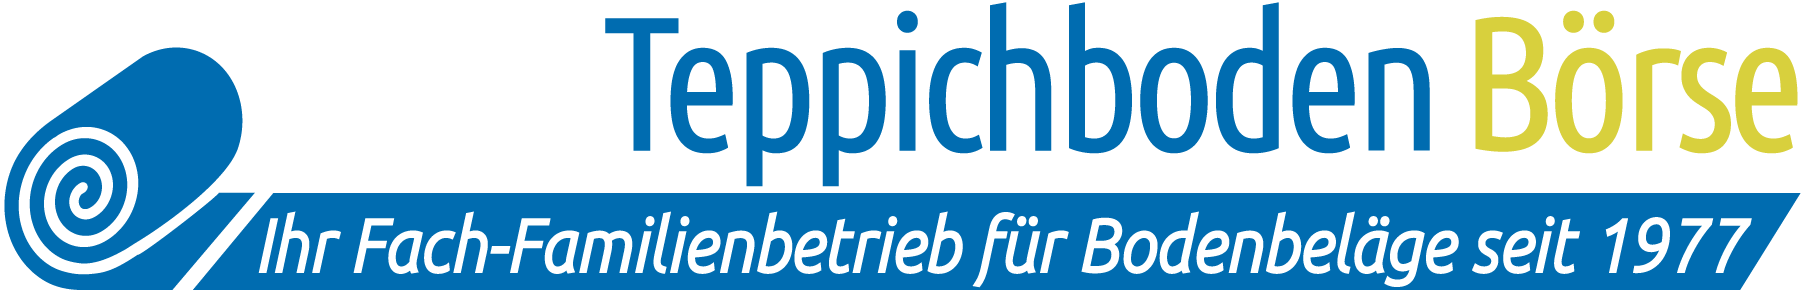 Teppichboden Börse-Logo